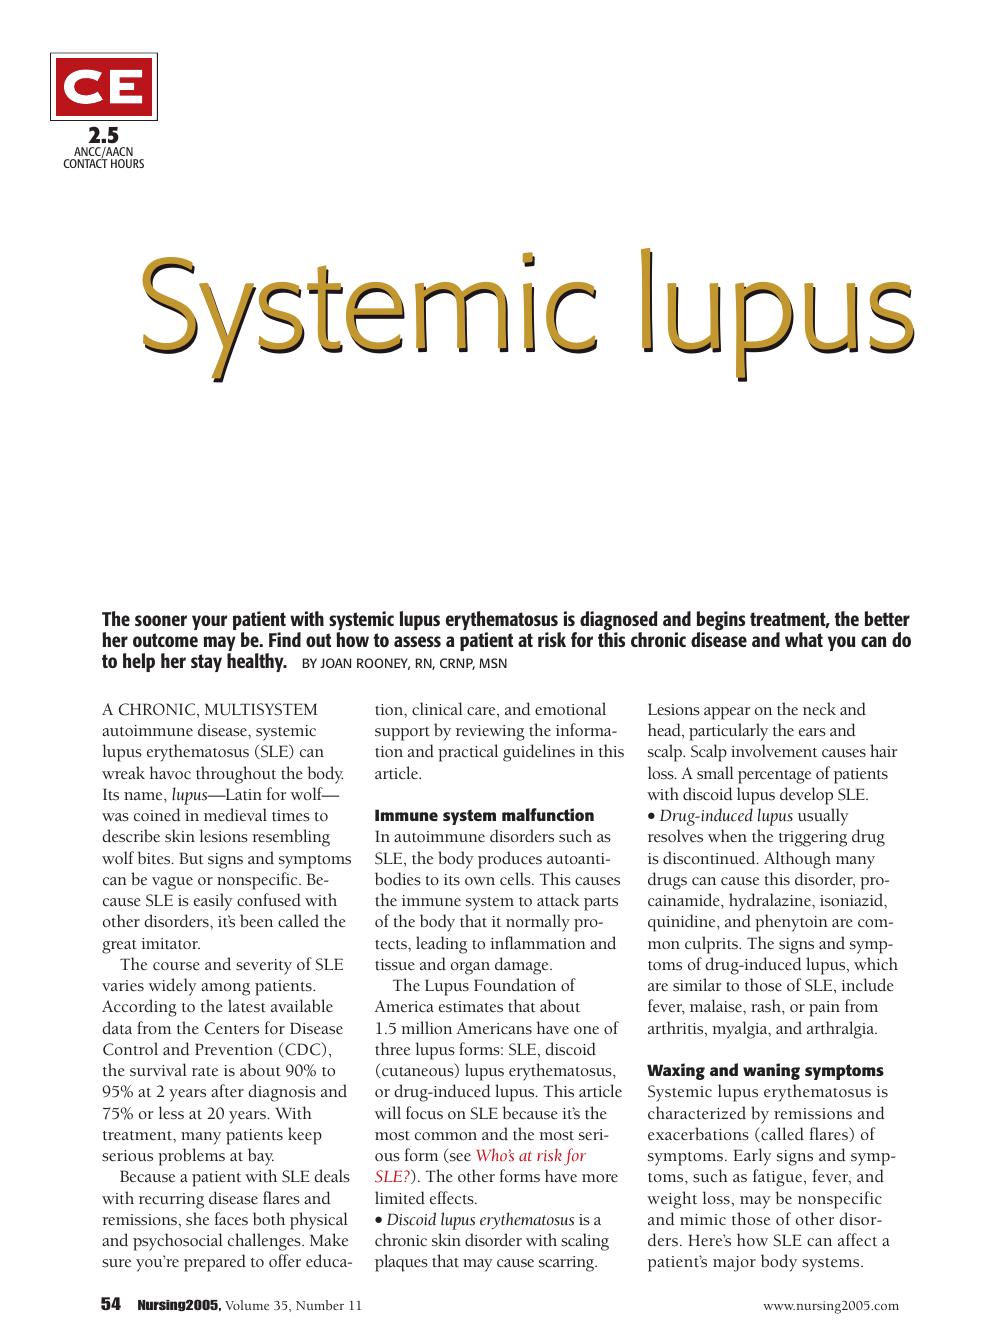 Lupus research paper write my paper cheap